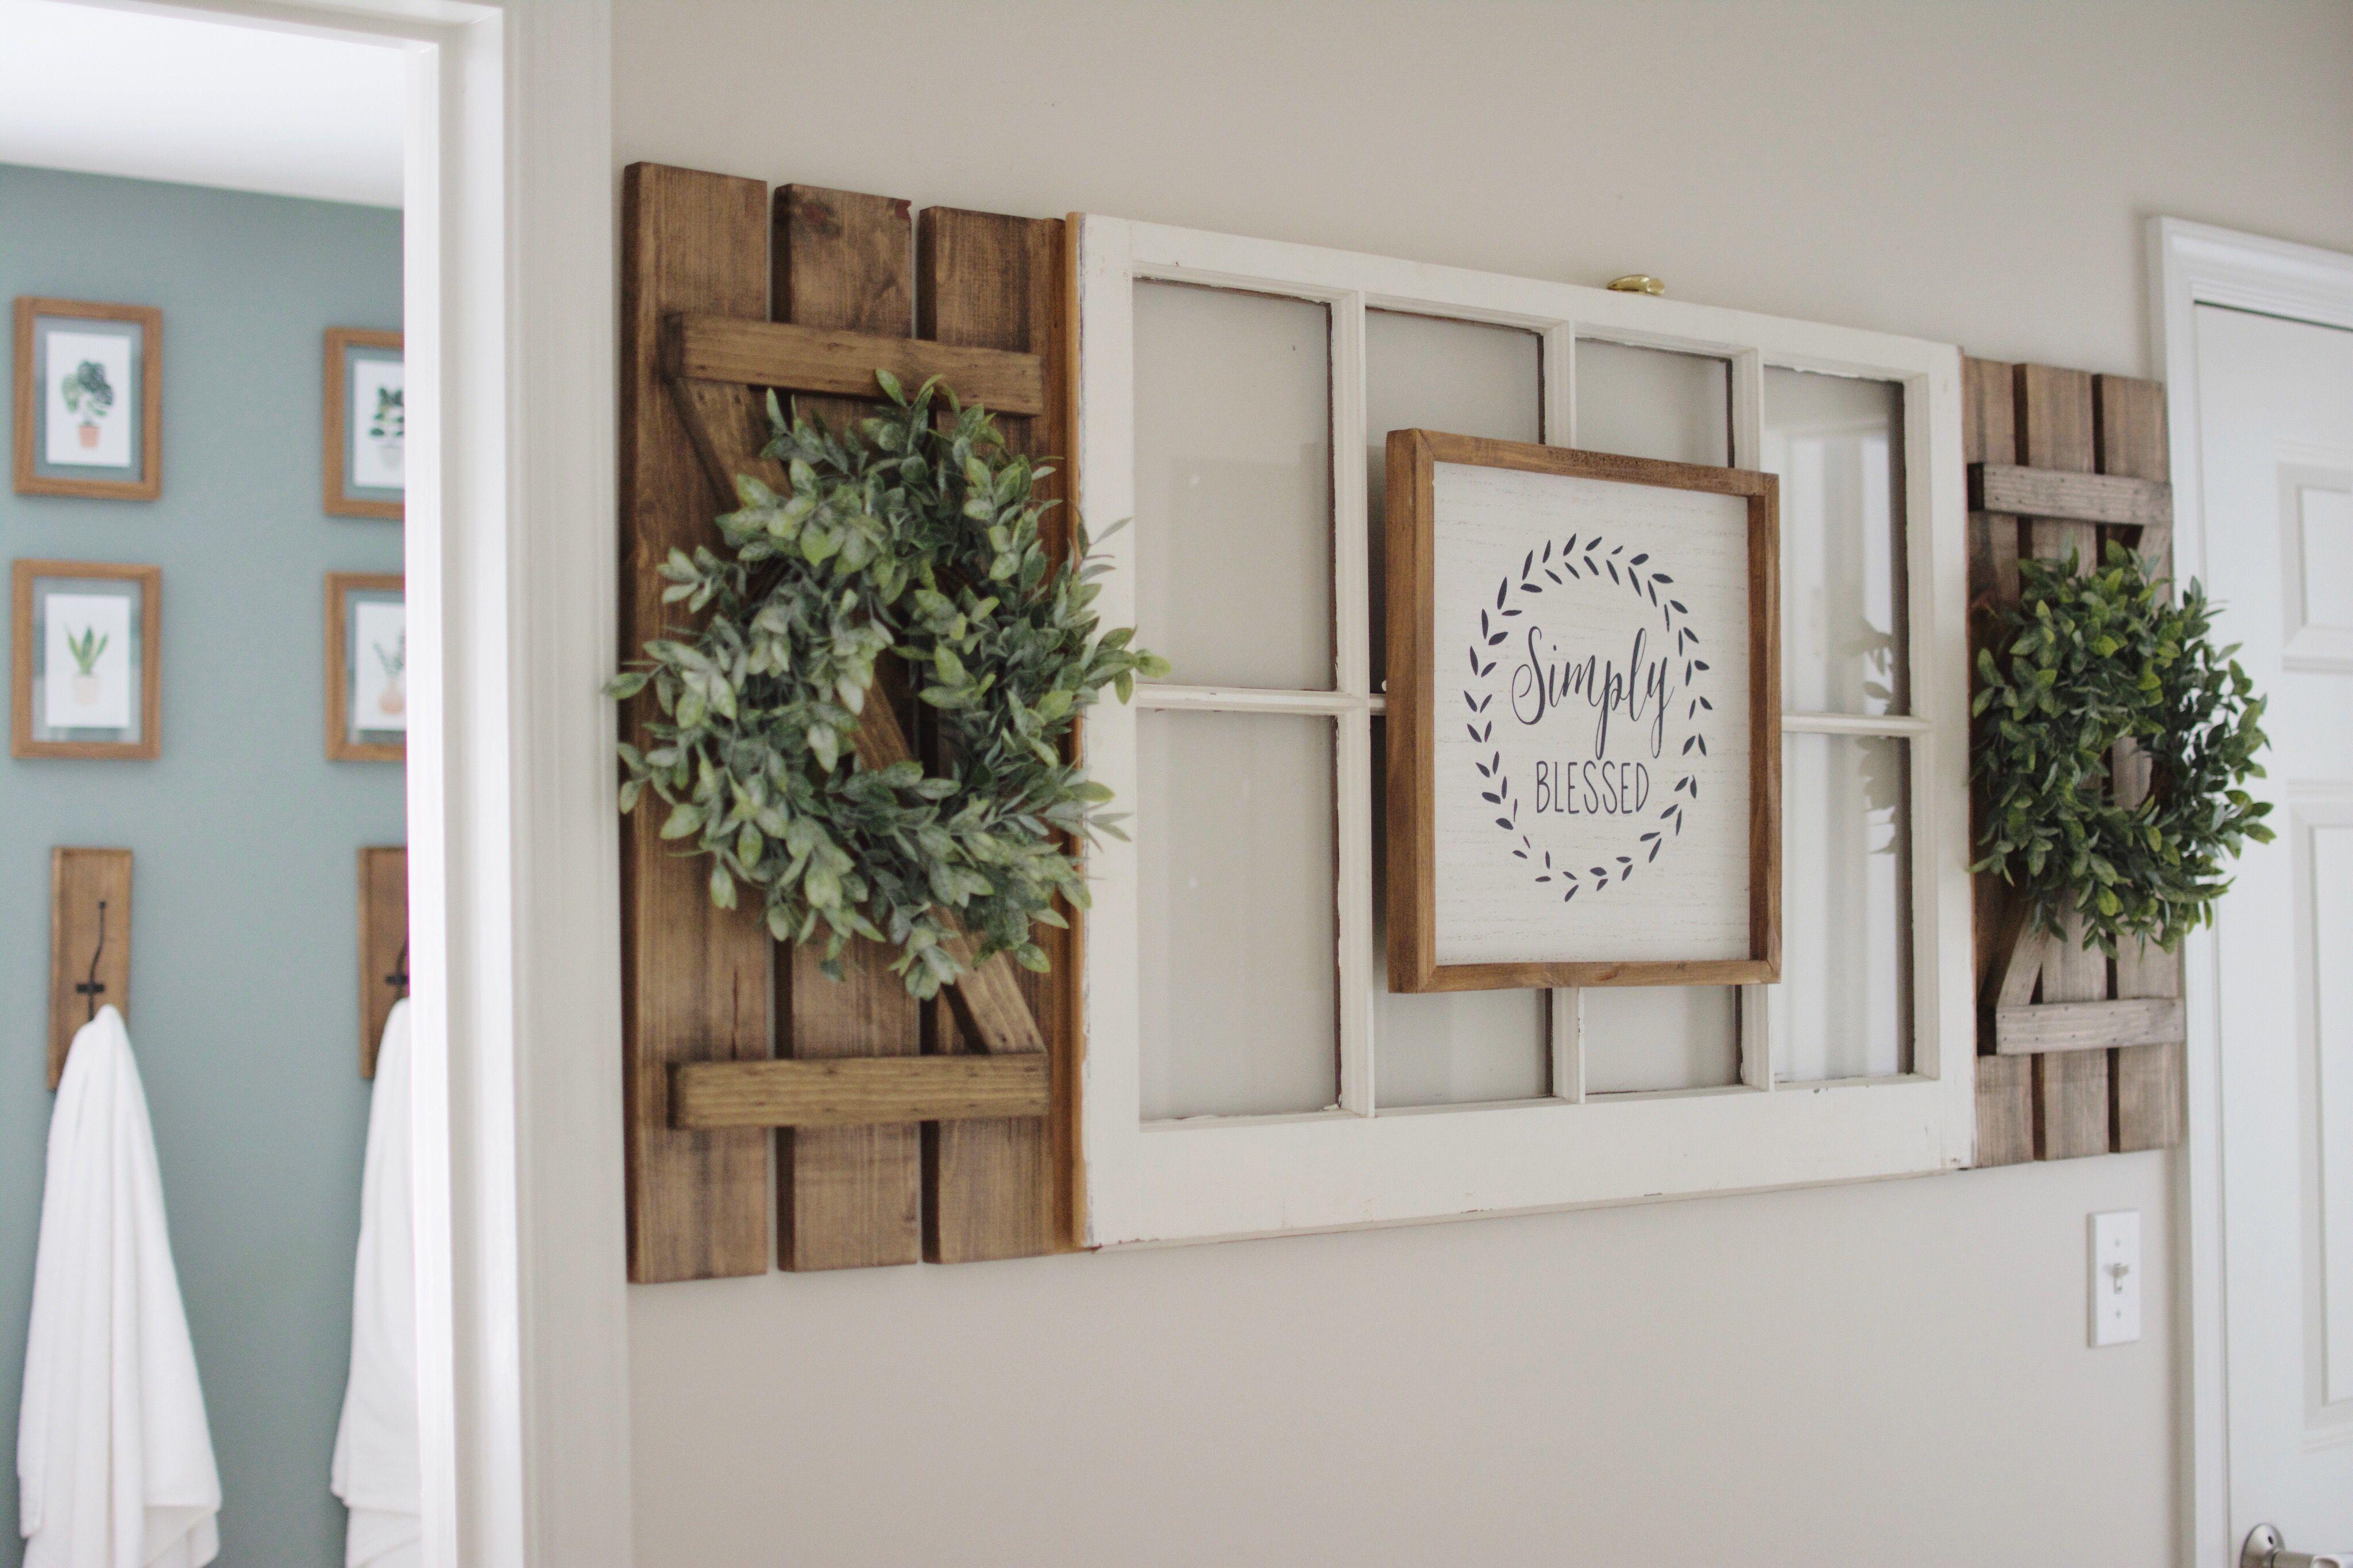 Farmhouse Hallway Shutter Wall Decor Farmhouse Dining Rooms Decor Window Wall Decor